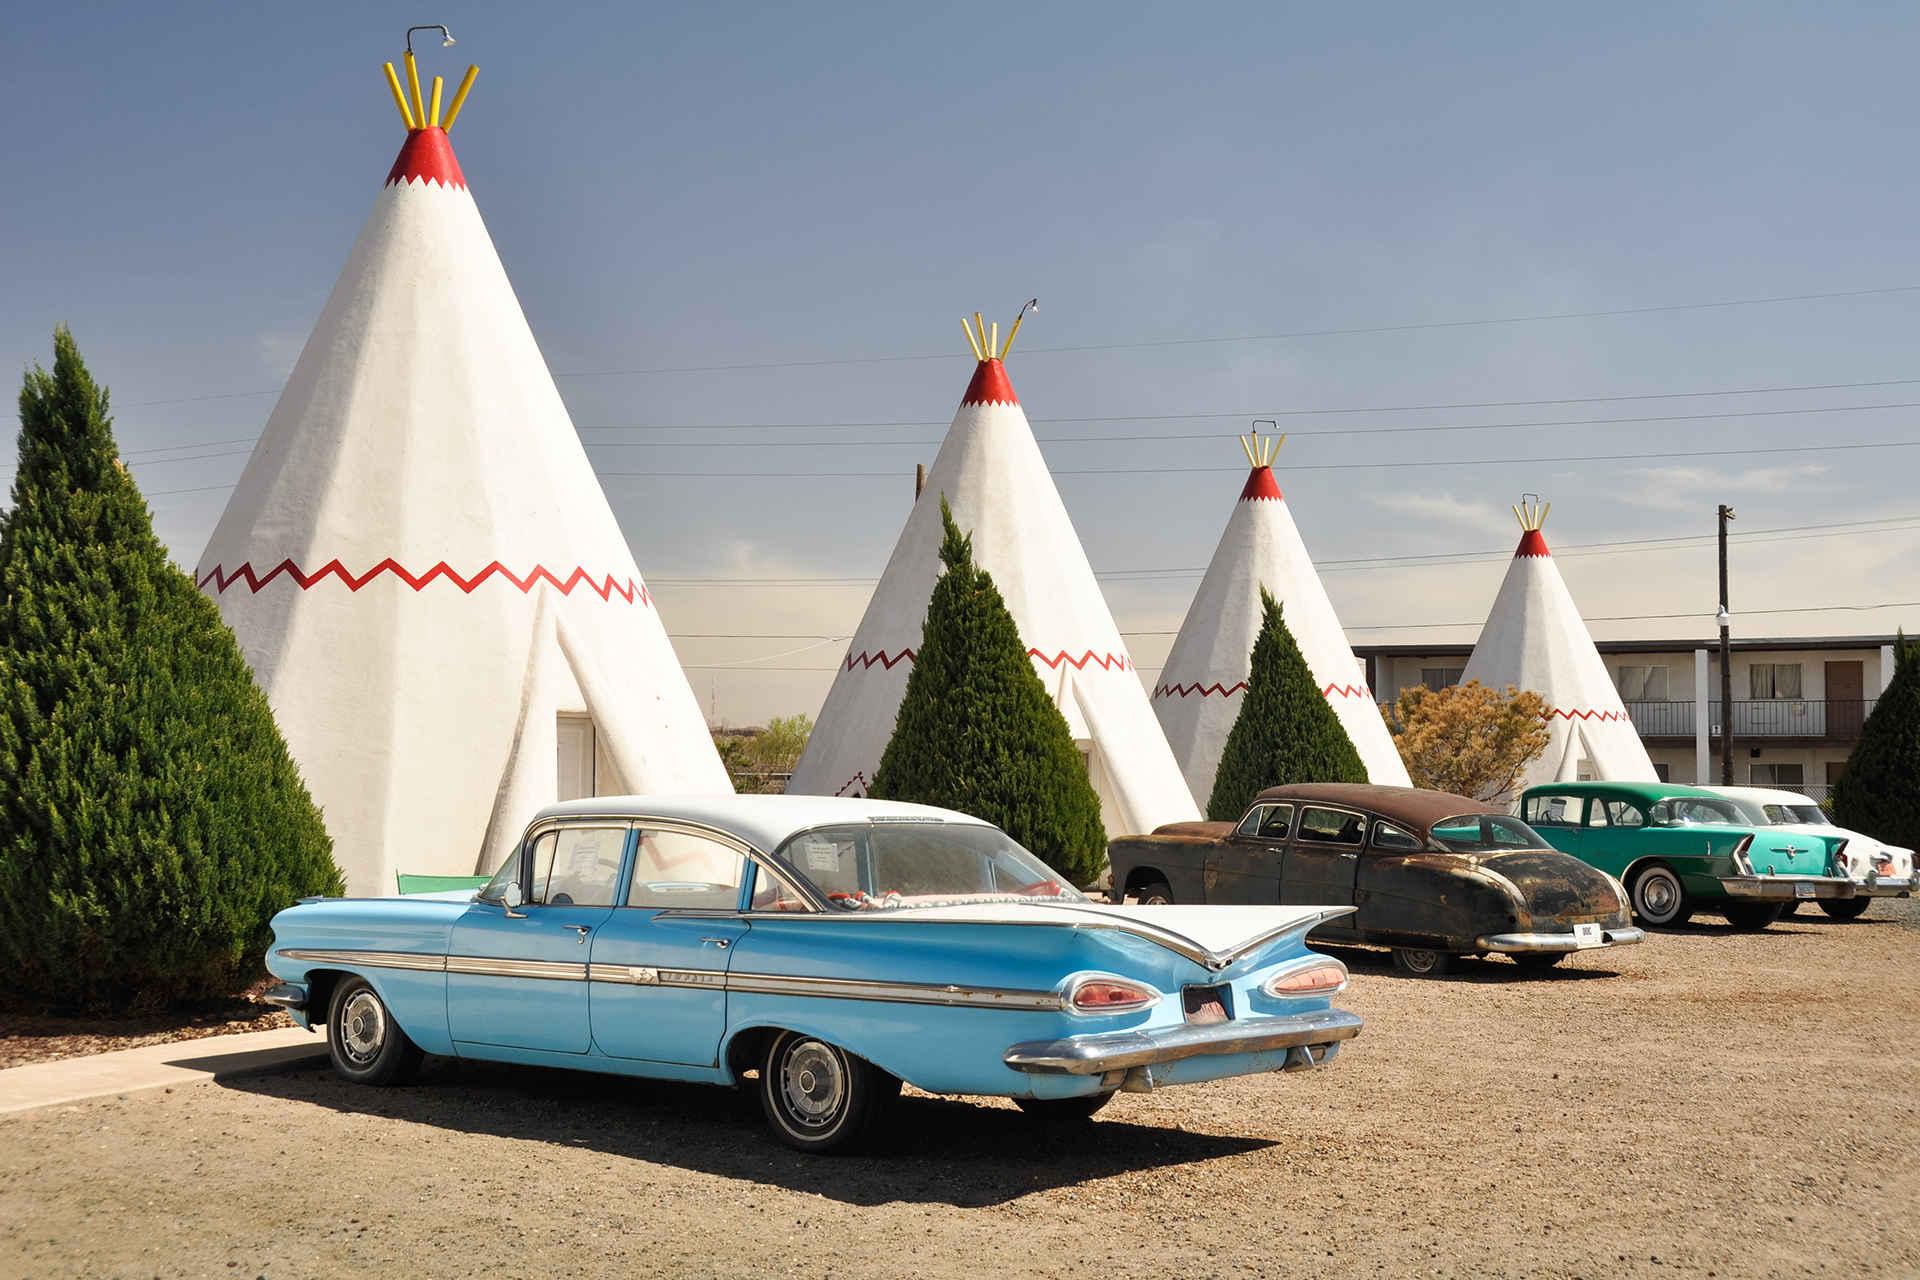 Wigwam Motel; Courtesy of Alberto Loyo/Shutterstock.com